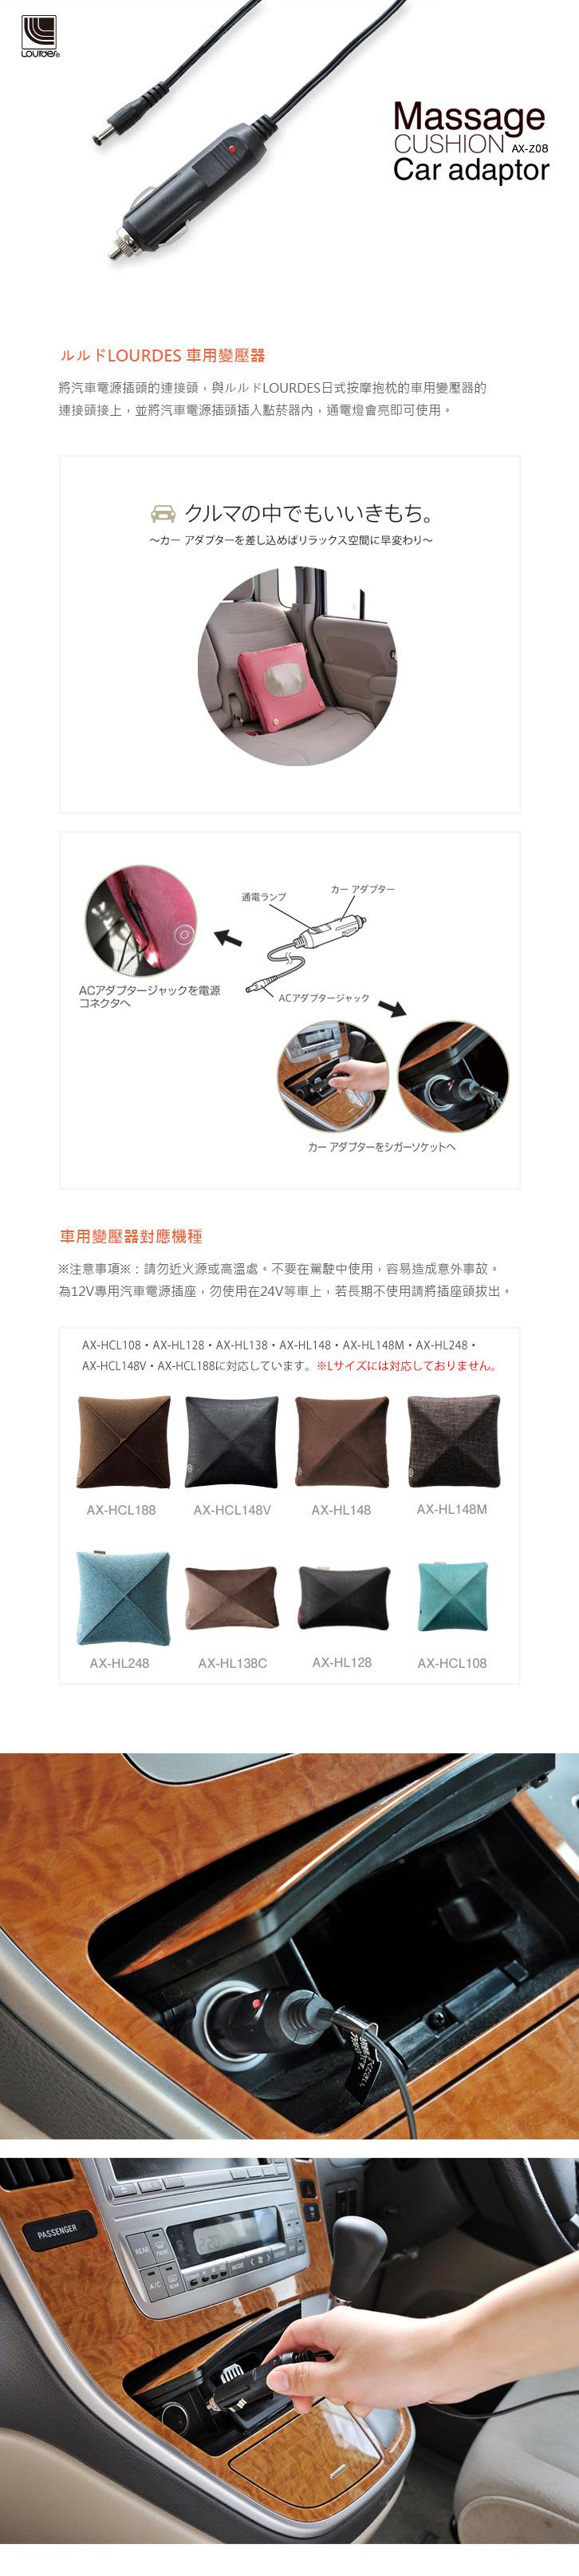 LOURDES 車用變壓器 (配合日式按摩抱枕使用) AX-Z08